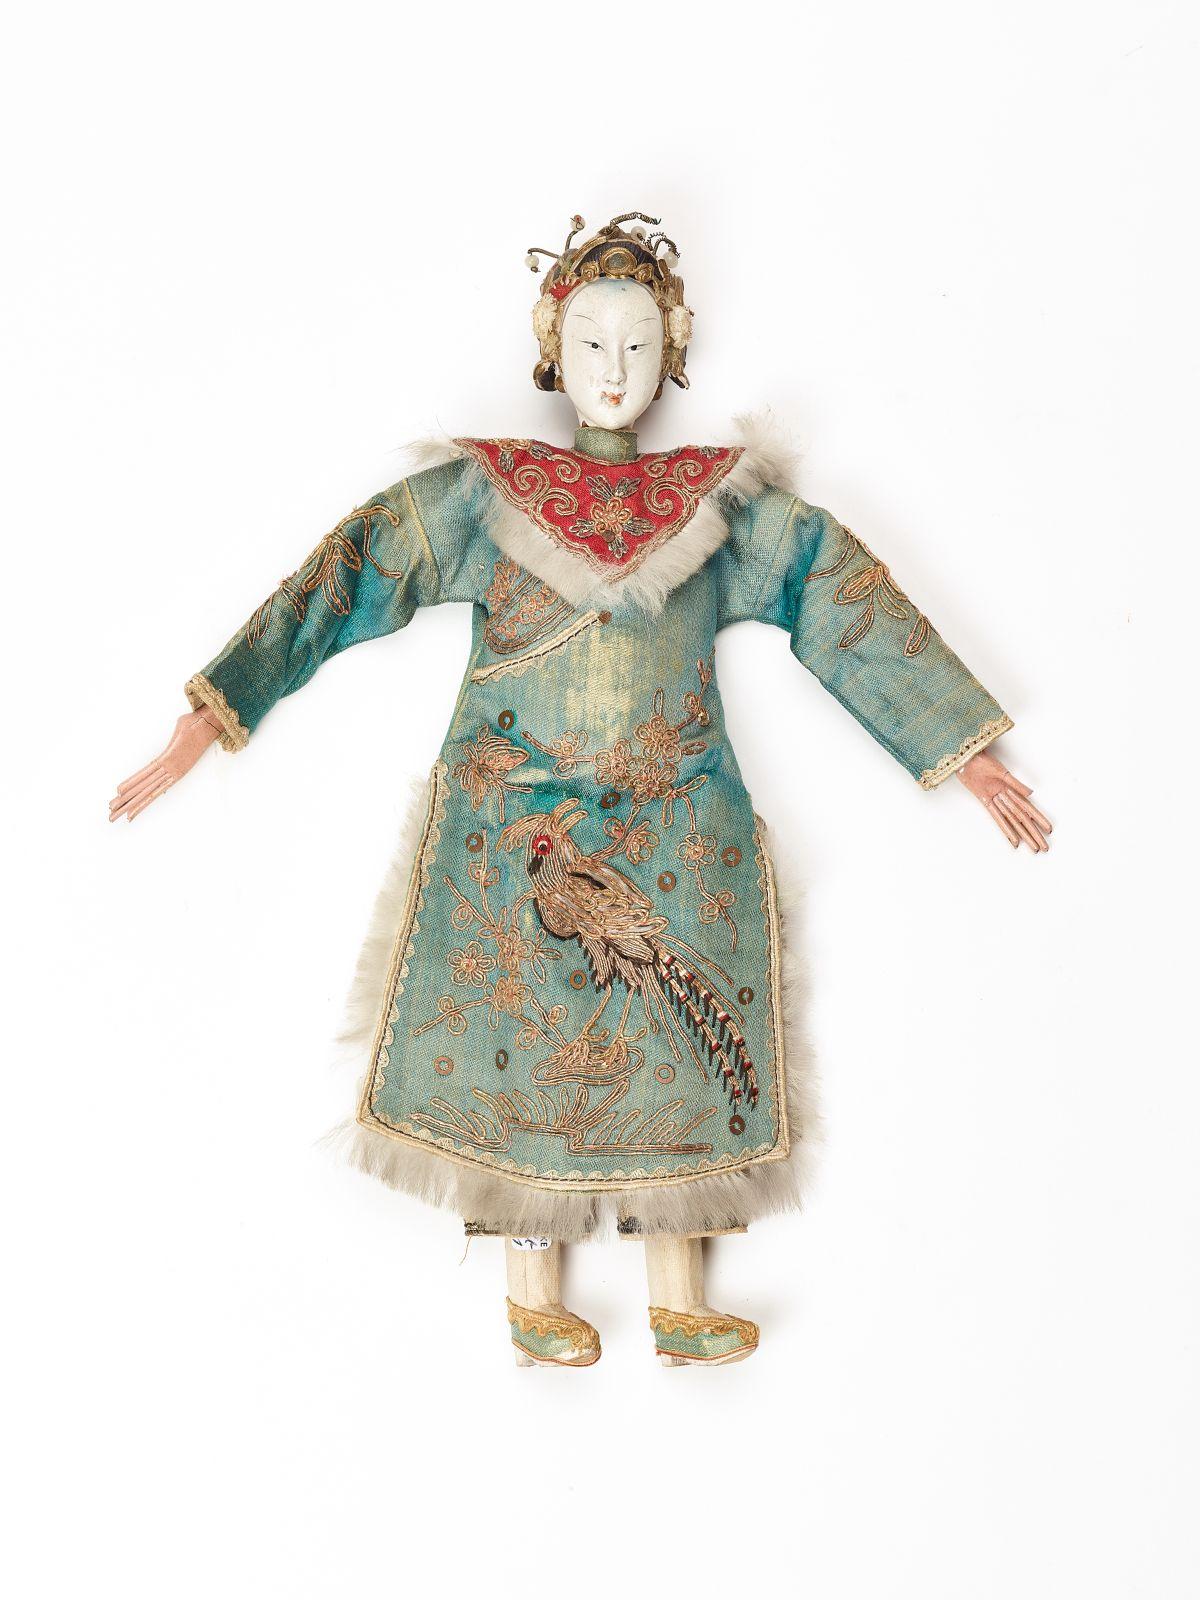 #177 A precious Chinese puppet of a Manchu court Lady, Qing Dynasty | Eine kostbare chinesische Marionette einer Mandschu-Hofdame, Qing-Dynastie Image